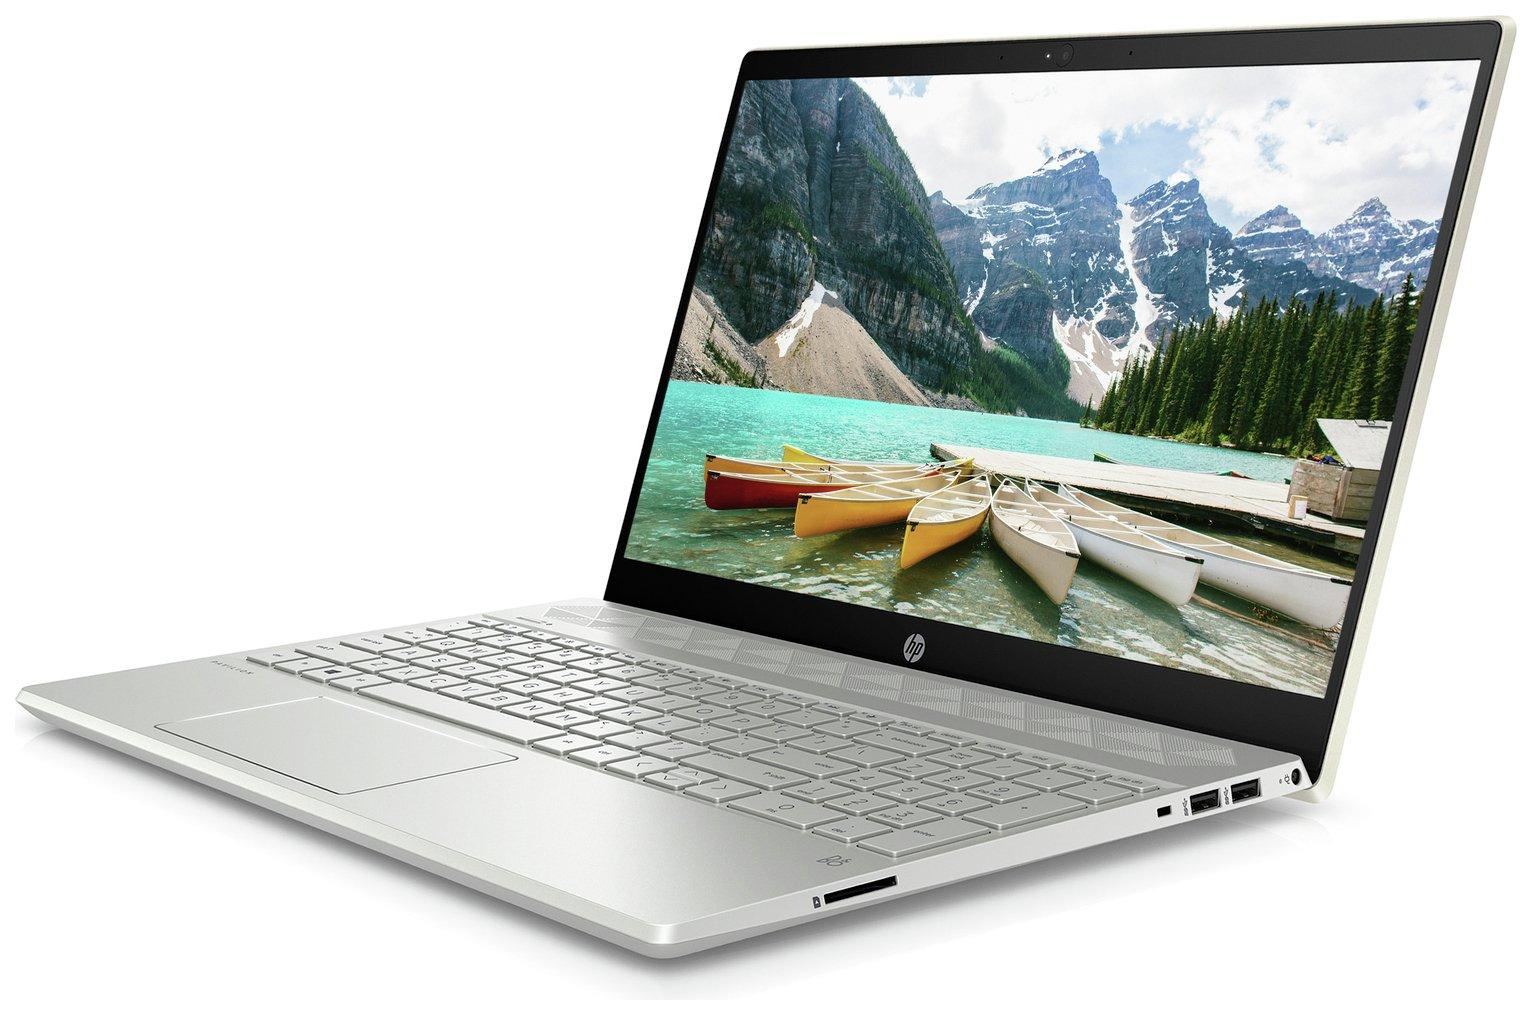 HP Pavilion 15.6 In Ryzen 3 8GB 128GB Full HD Laptop - Gold